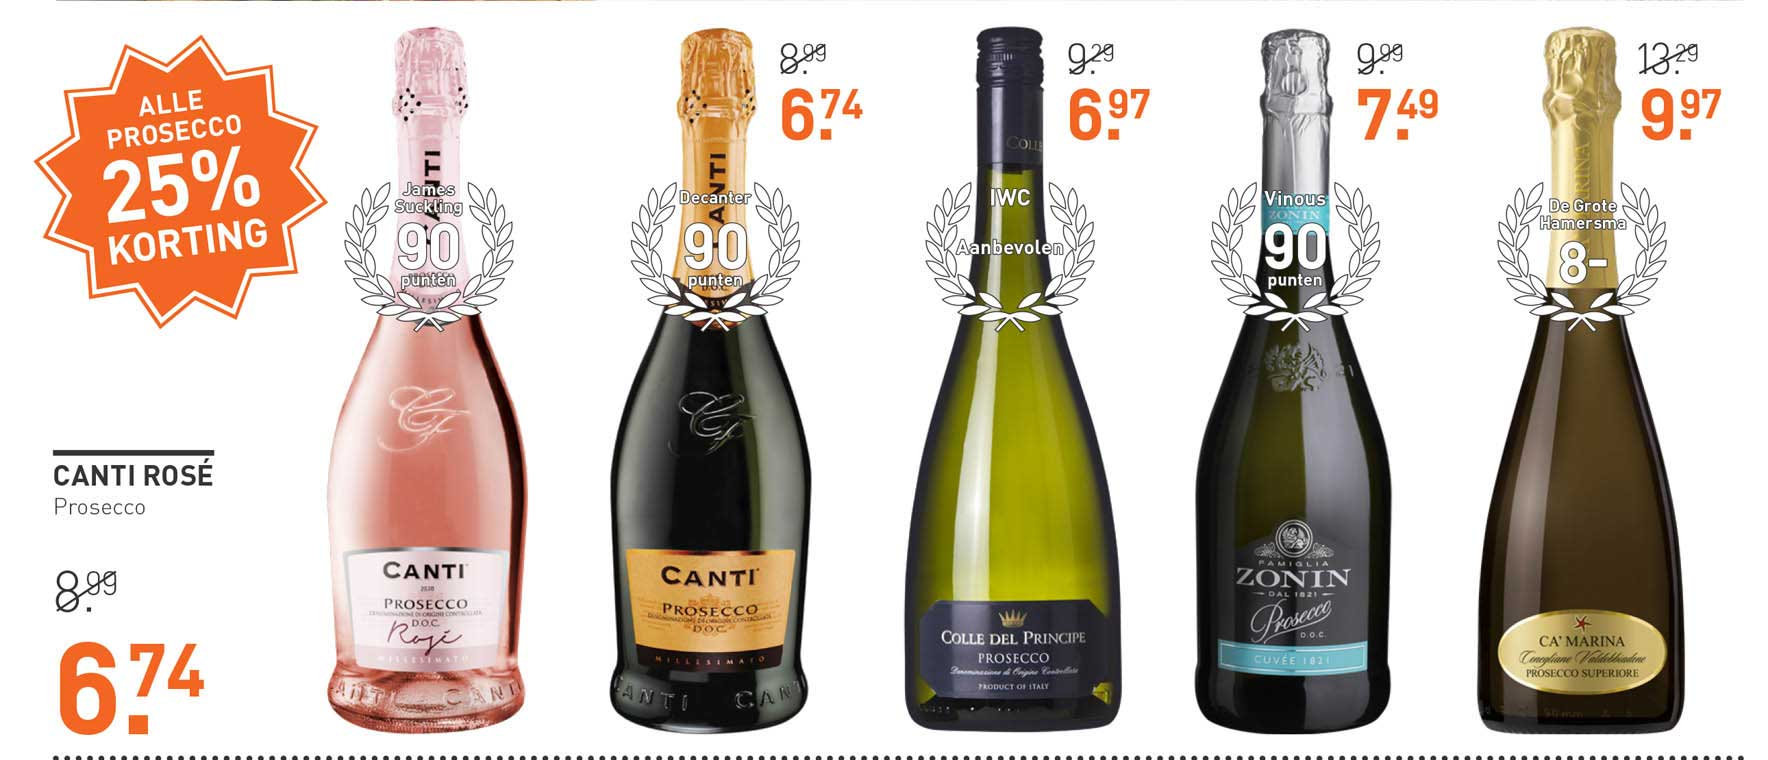 Gall & Gall Canti Rosé Prosecco 25% Korting